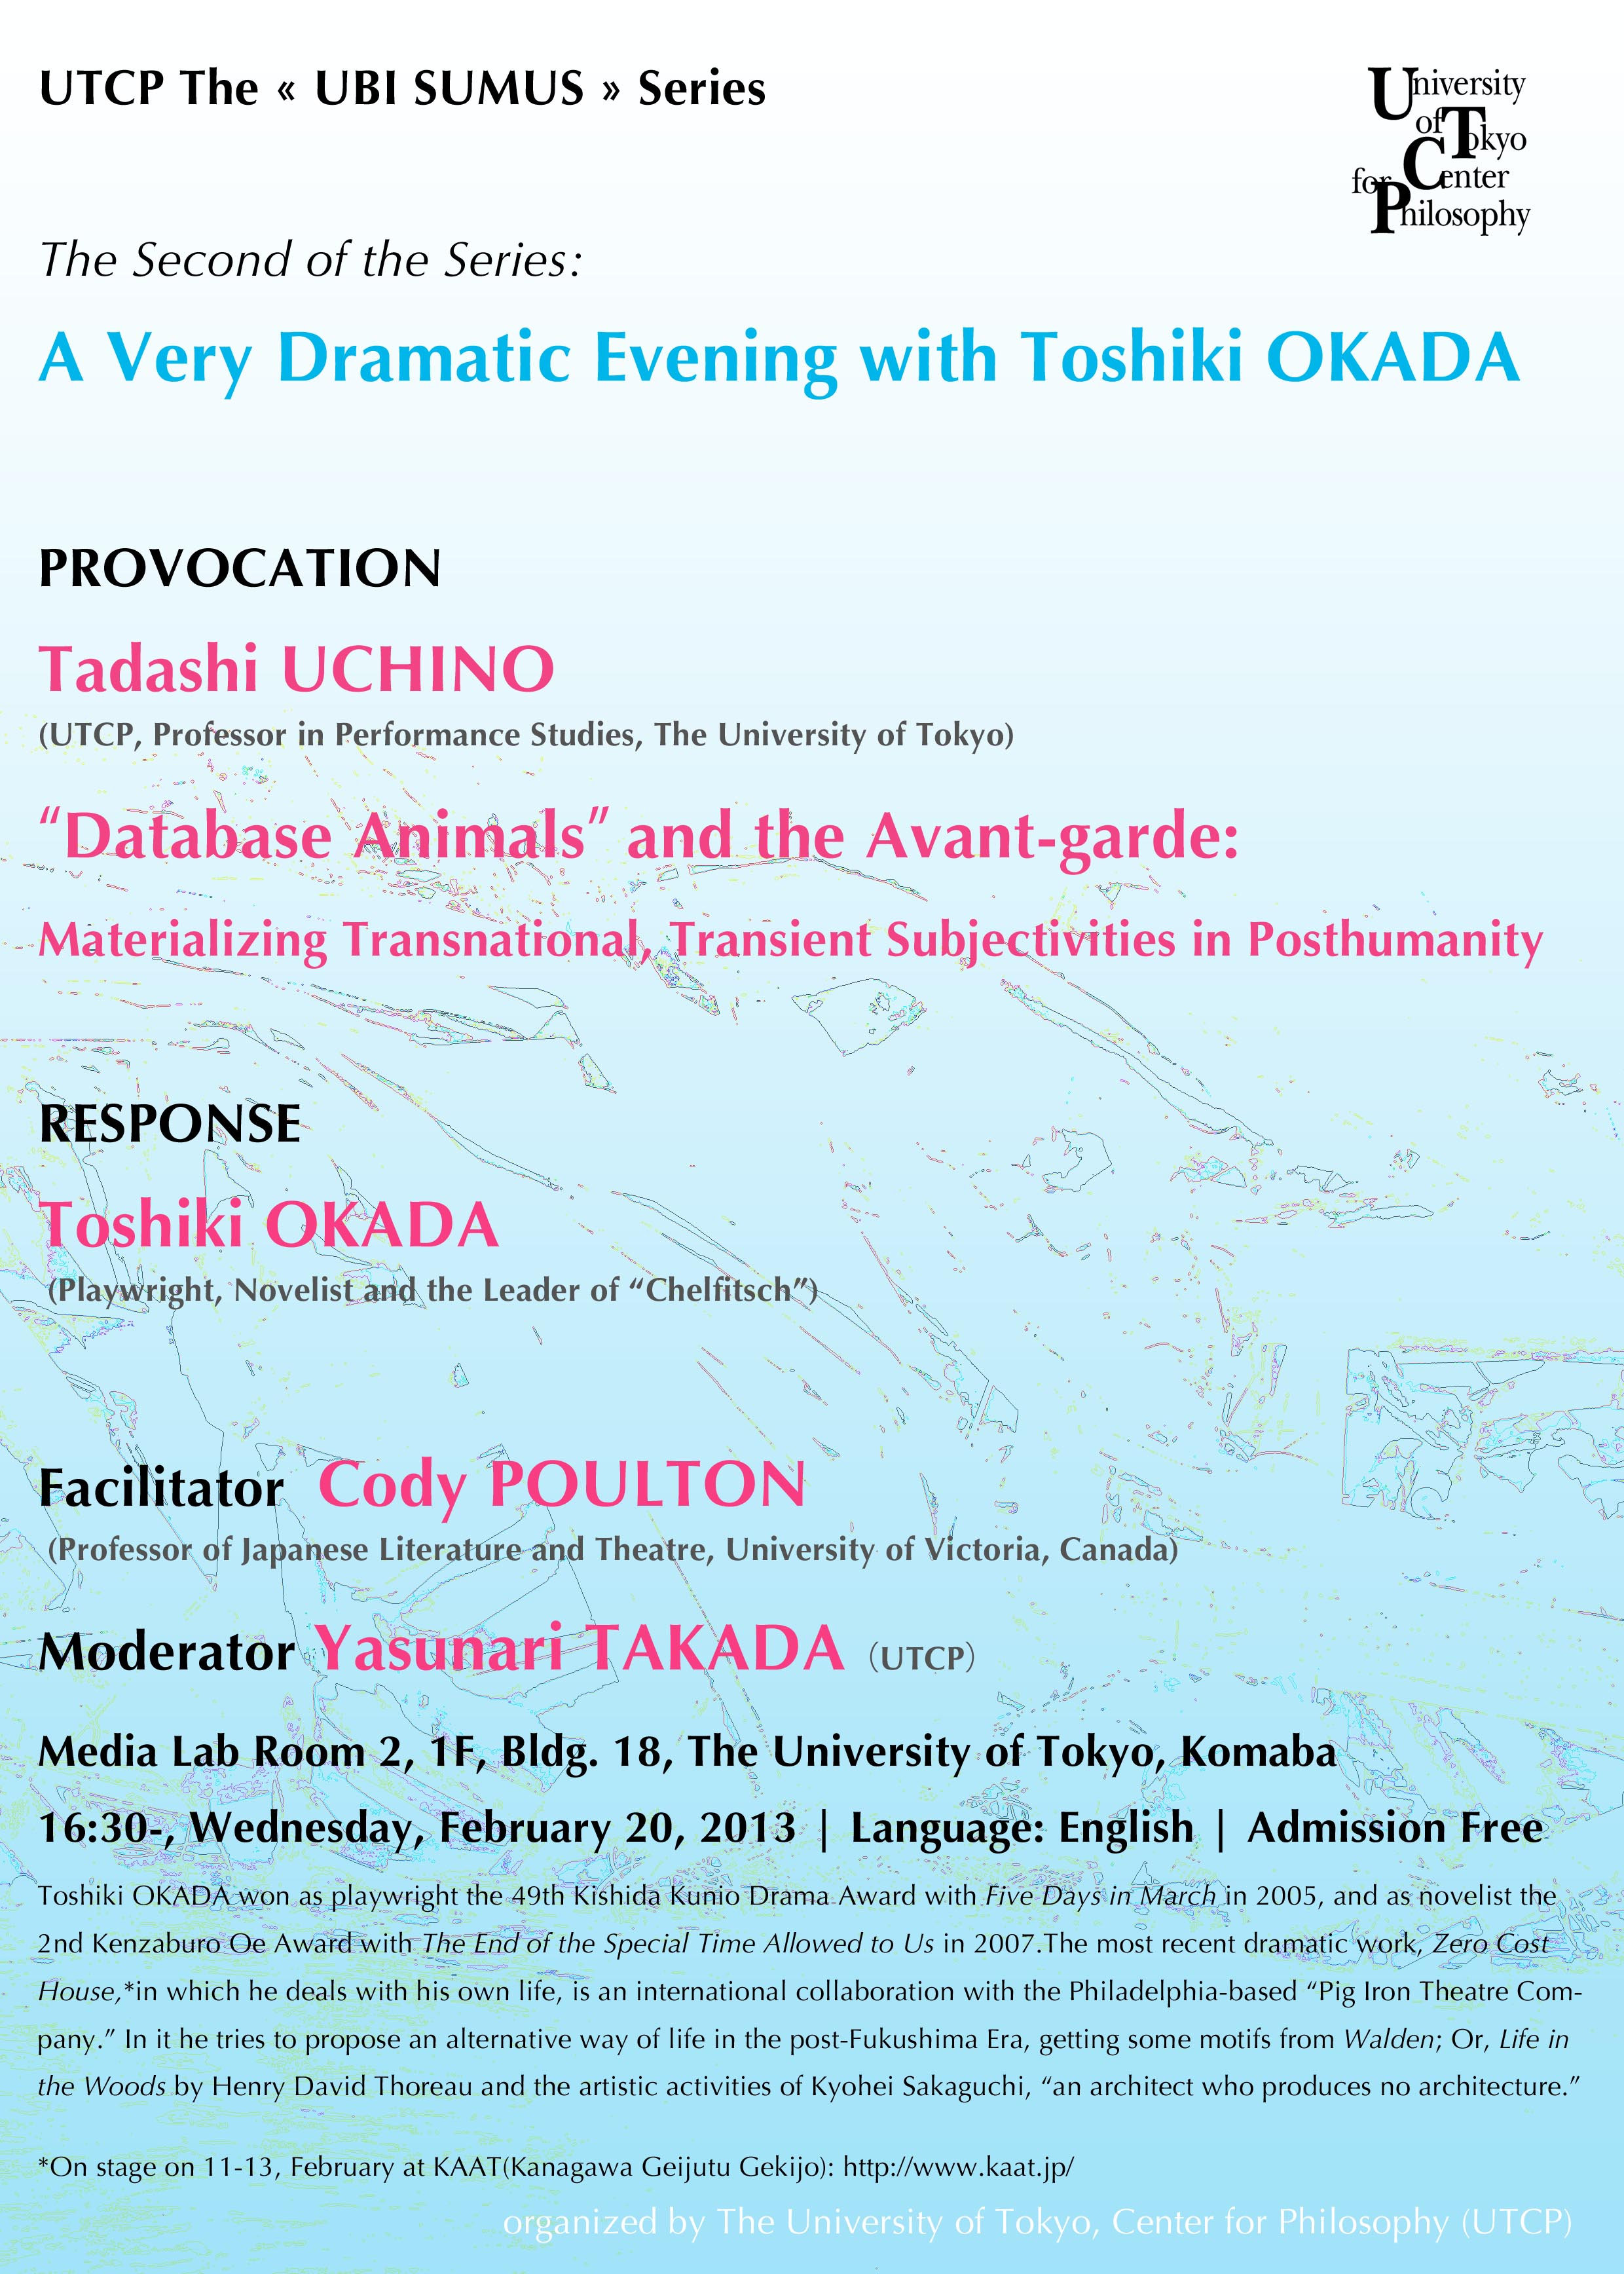 20130220_OKADA_poster.jpg